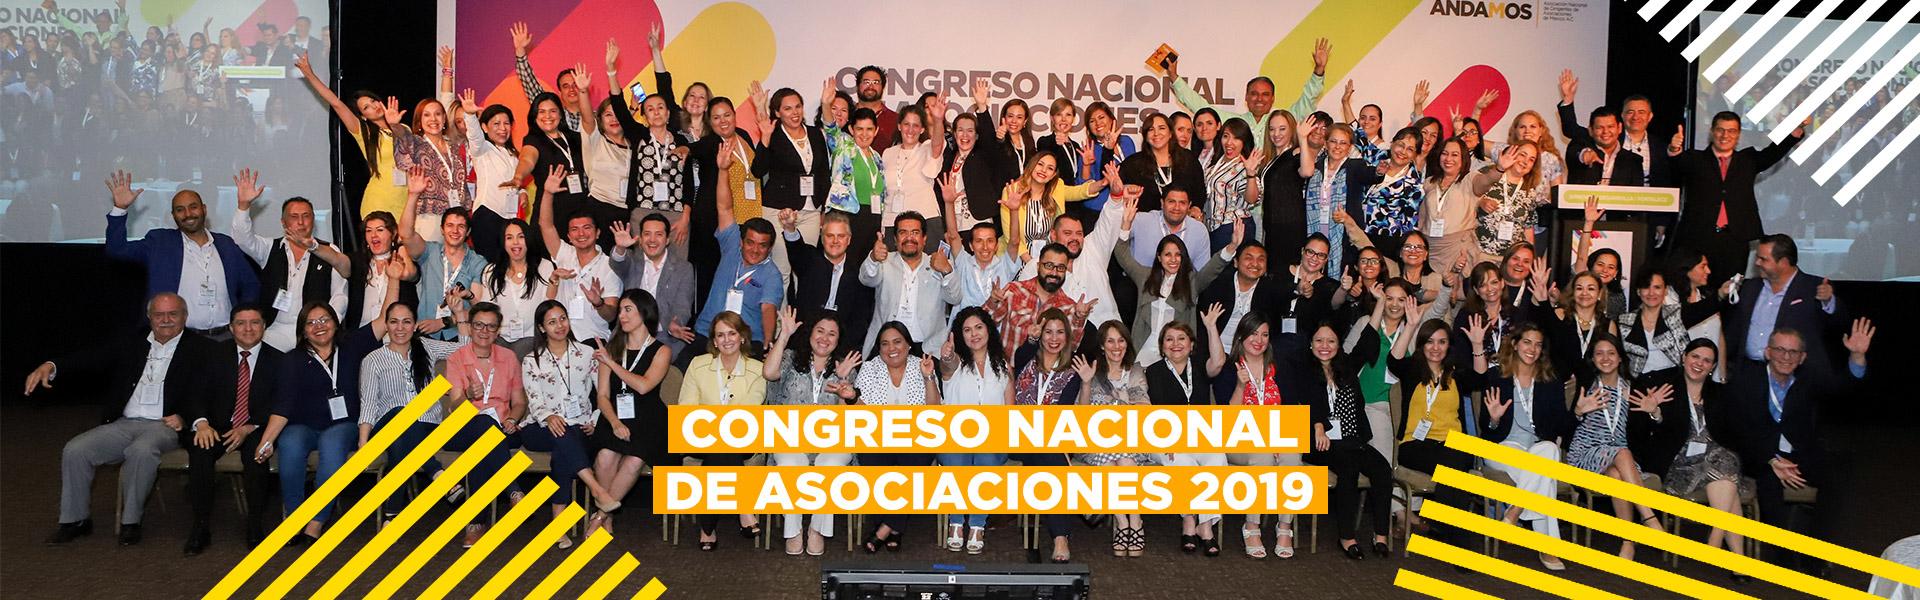 slider-congreso-nacional